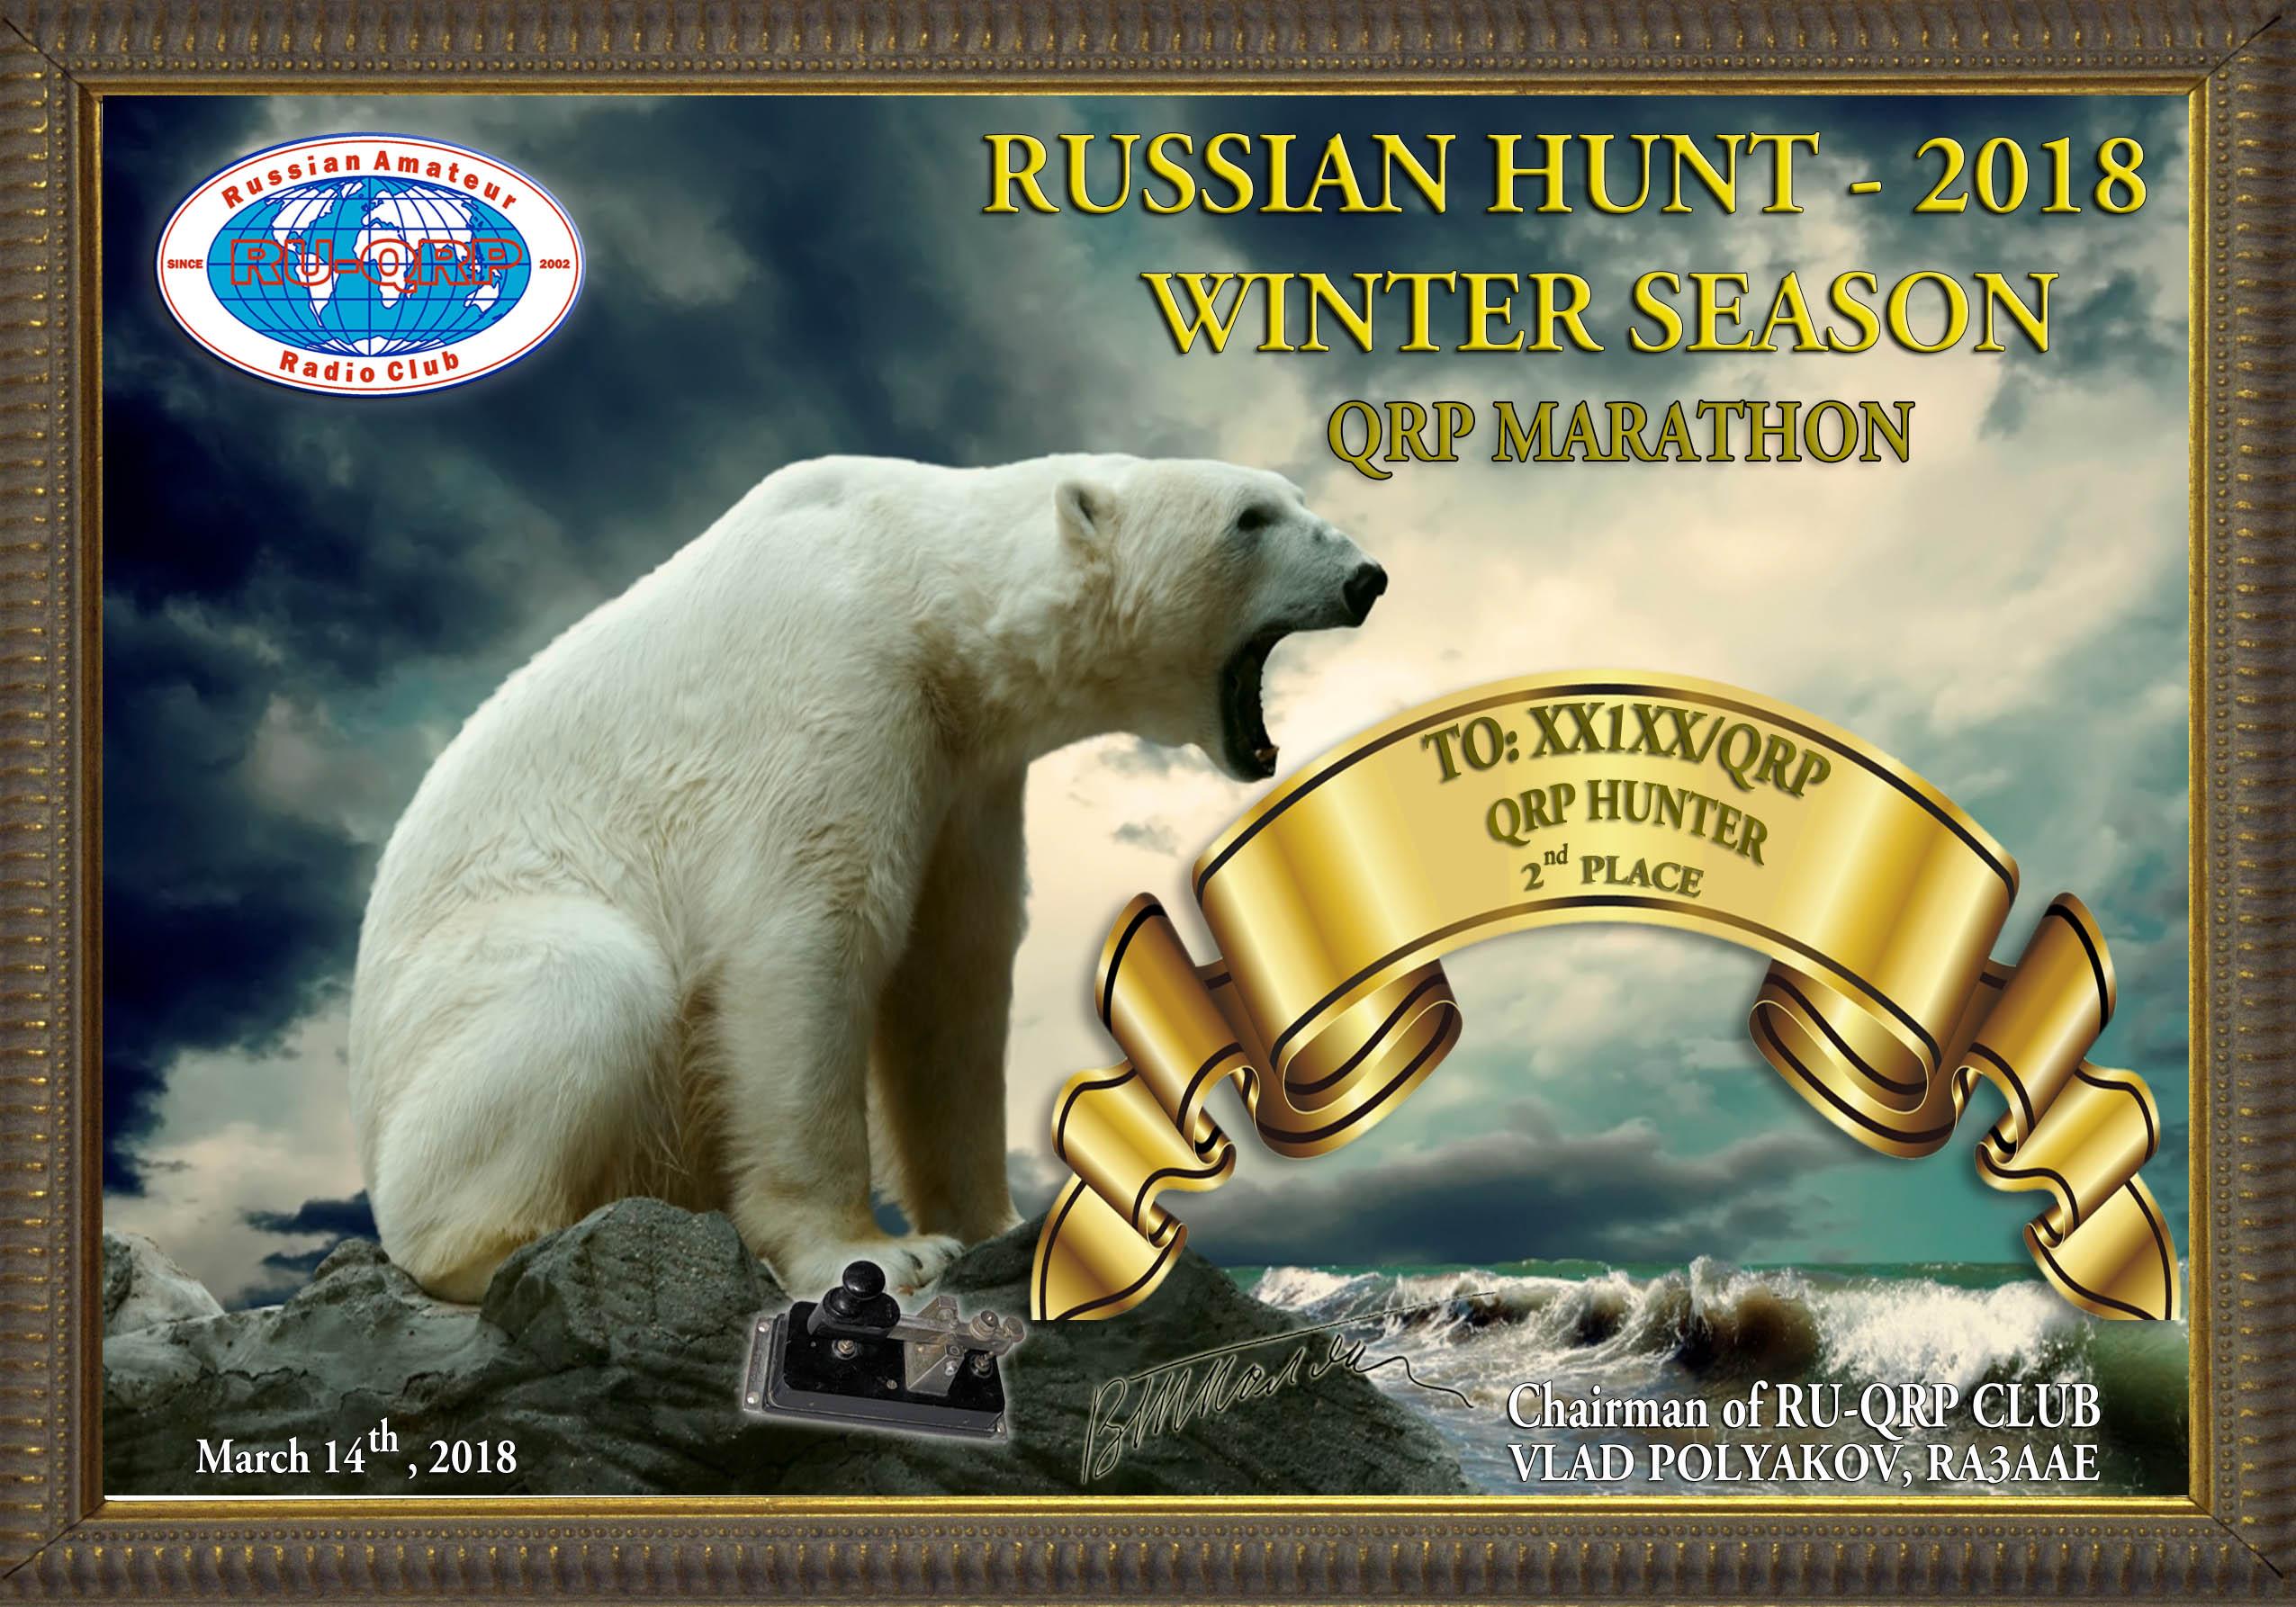 Нажмите на изображение для увеличения.  Название:2018- RUSSIAN HUNT WINTER SEASON.jpg Просмотров:6 Размер:570.9 Кб ID:204898